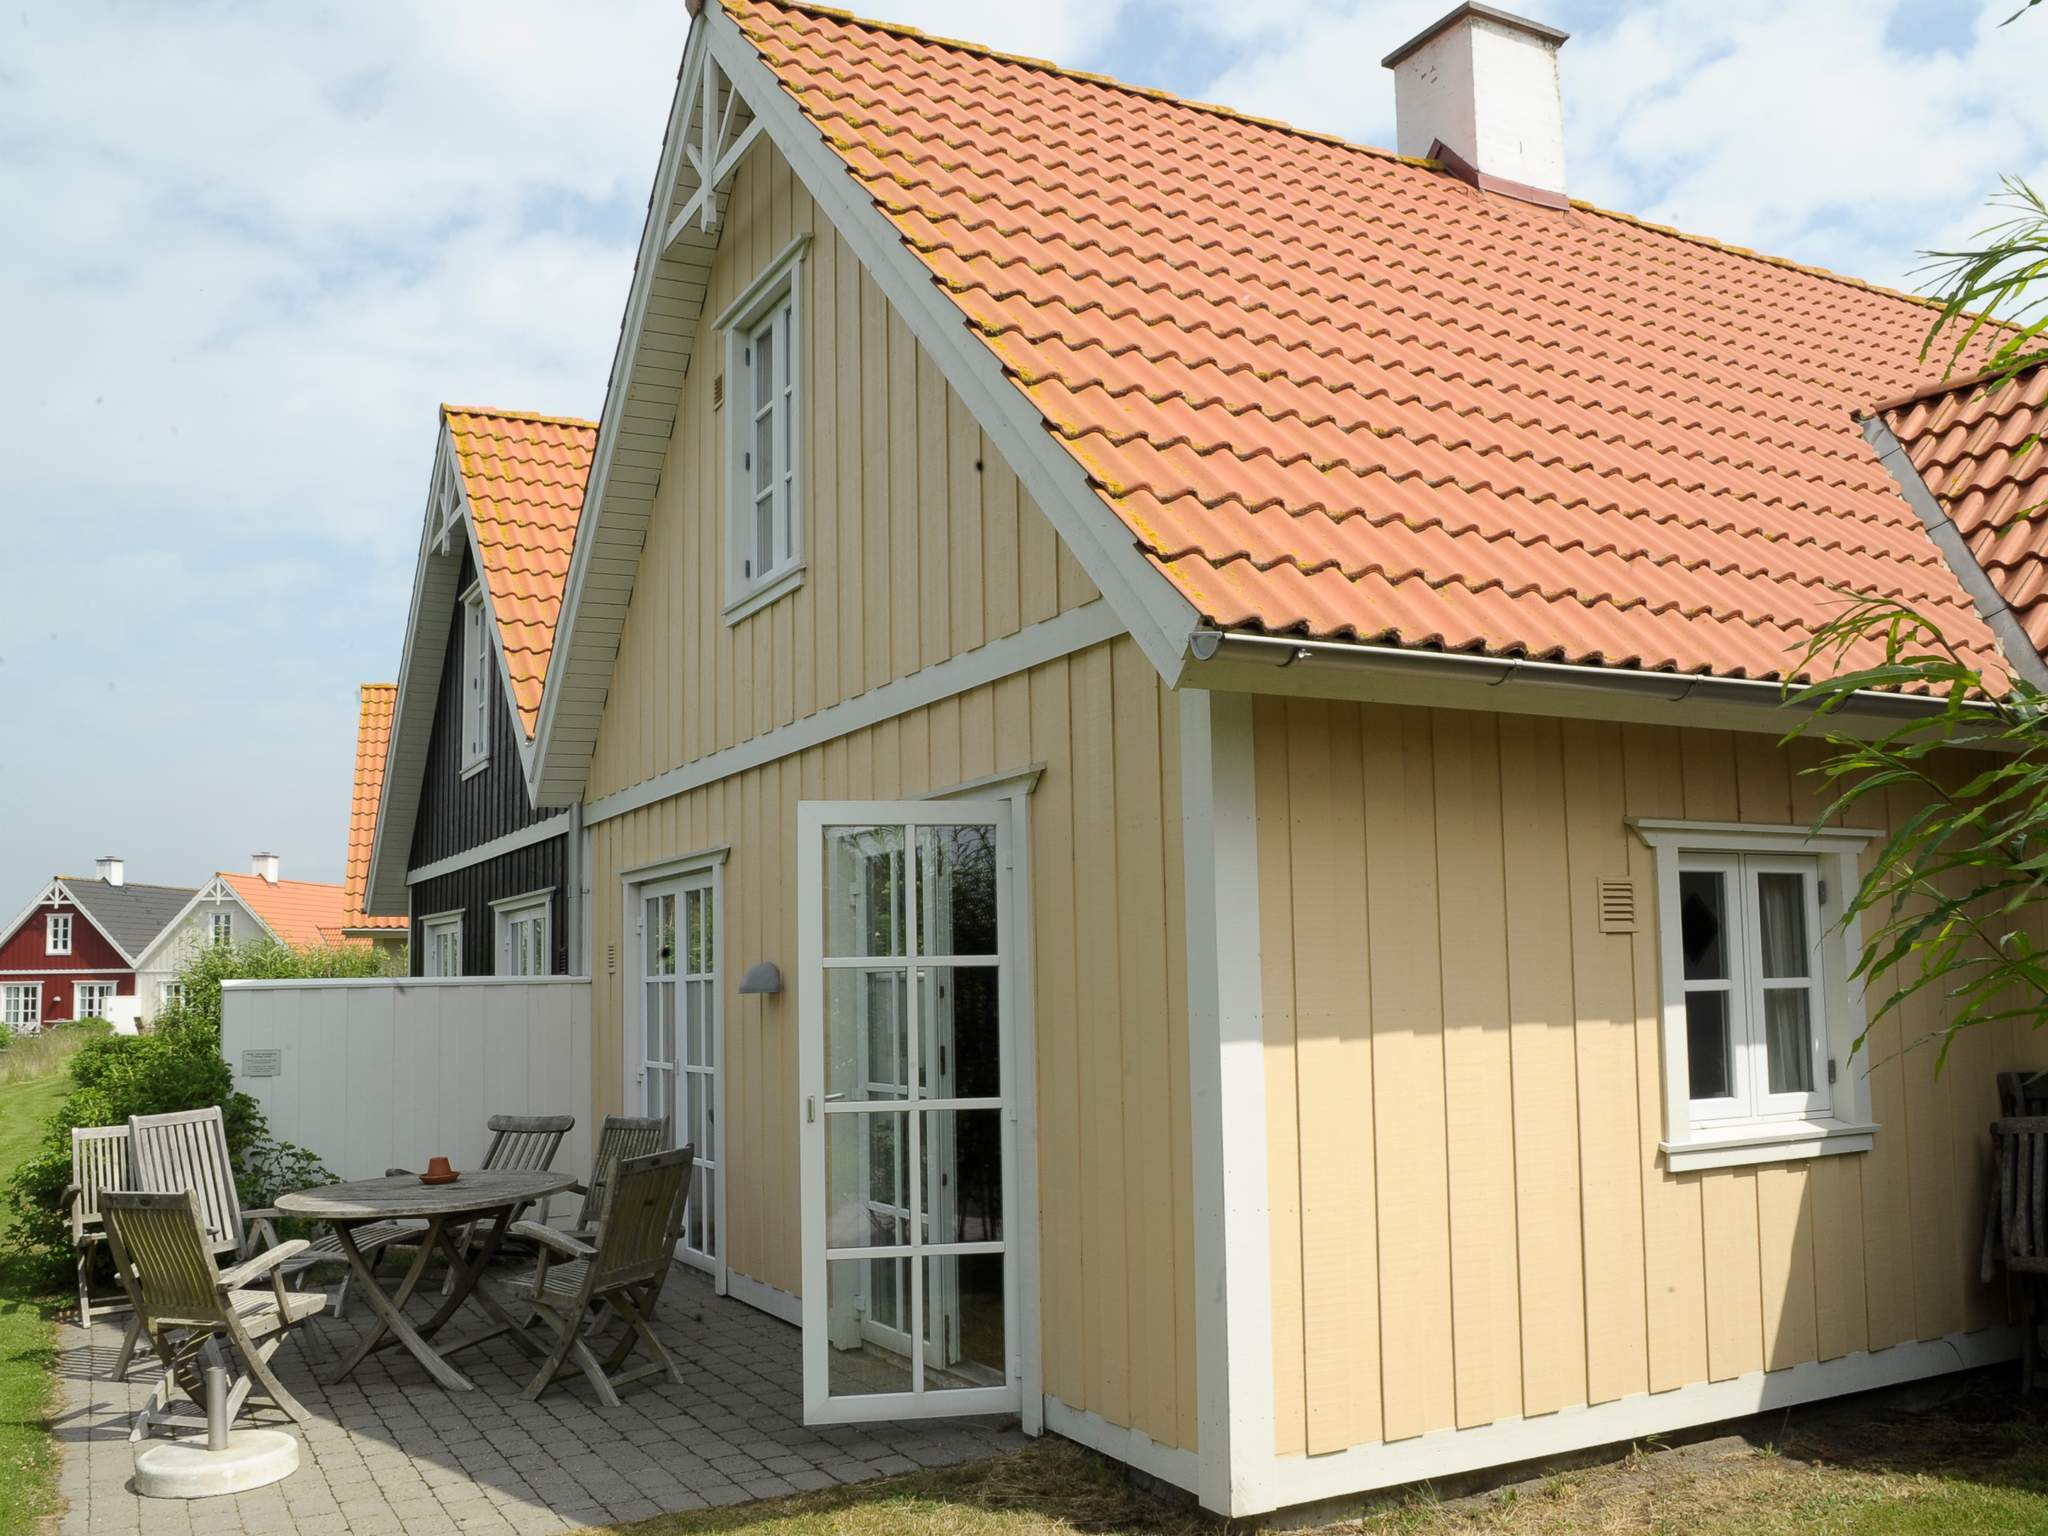 Ferienhaus Blåvand (224791), Blåvand, , Westjütland, Dänemark, Bild 14